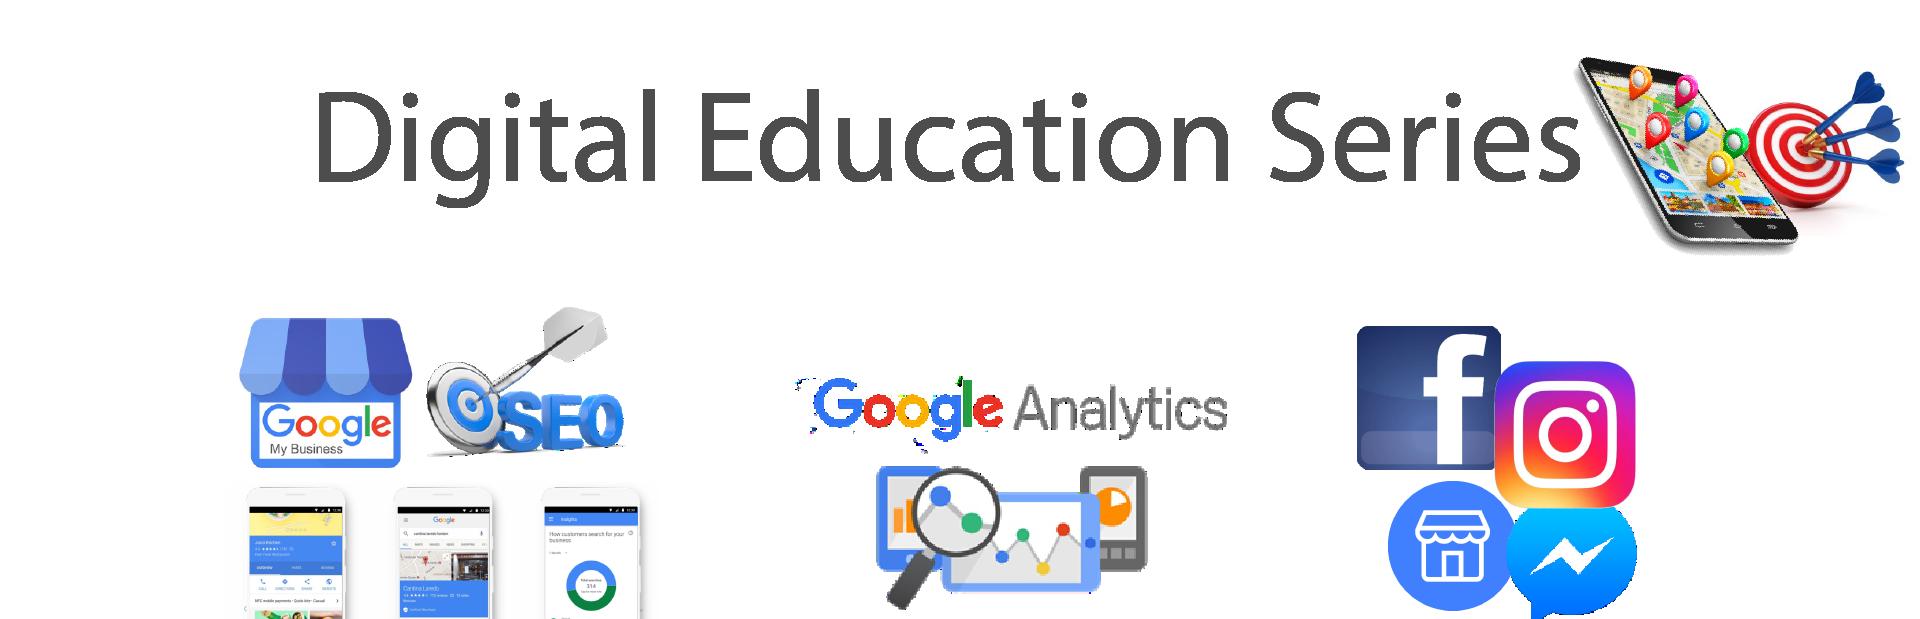 Digital Education Series Banner-01-01